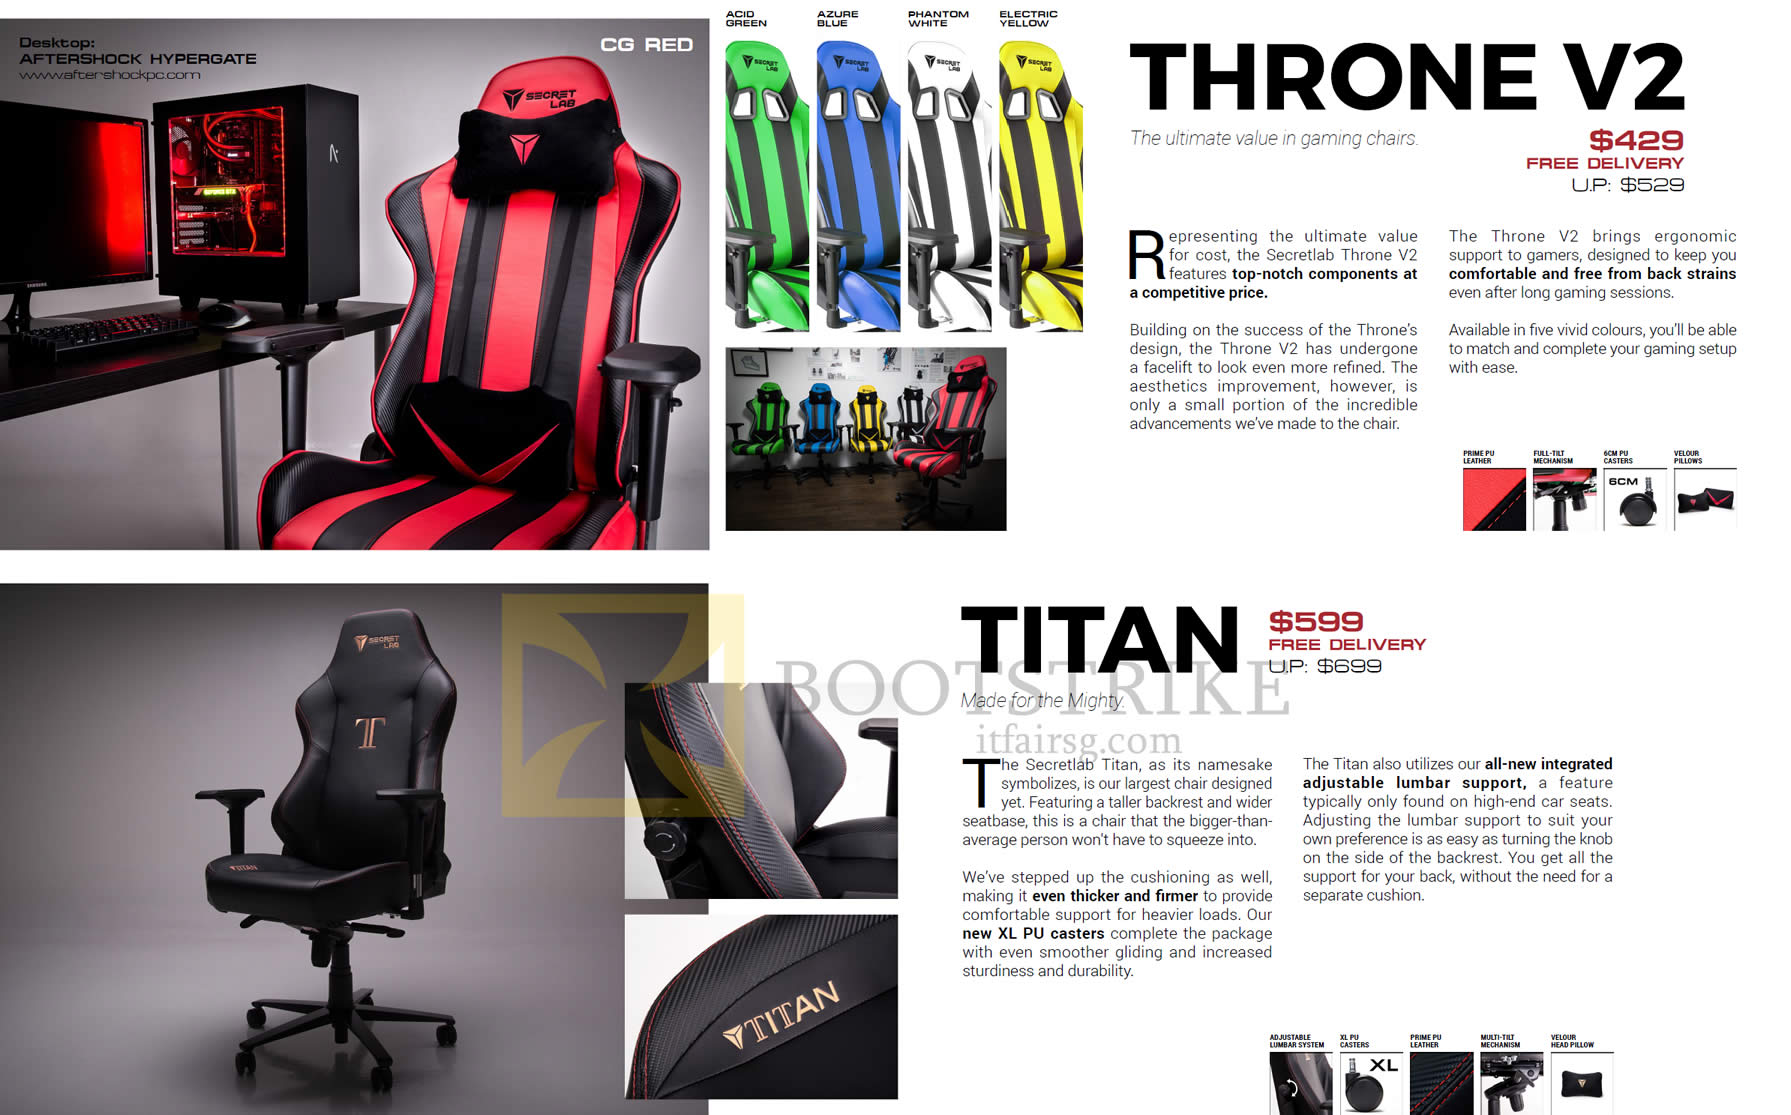 COMEX 2016 price list image brochure of Secretlab Chairs Throne V2, Titan